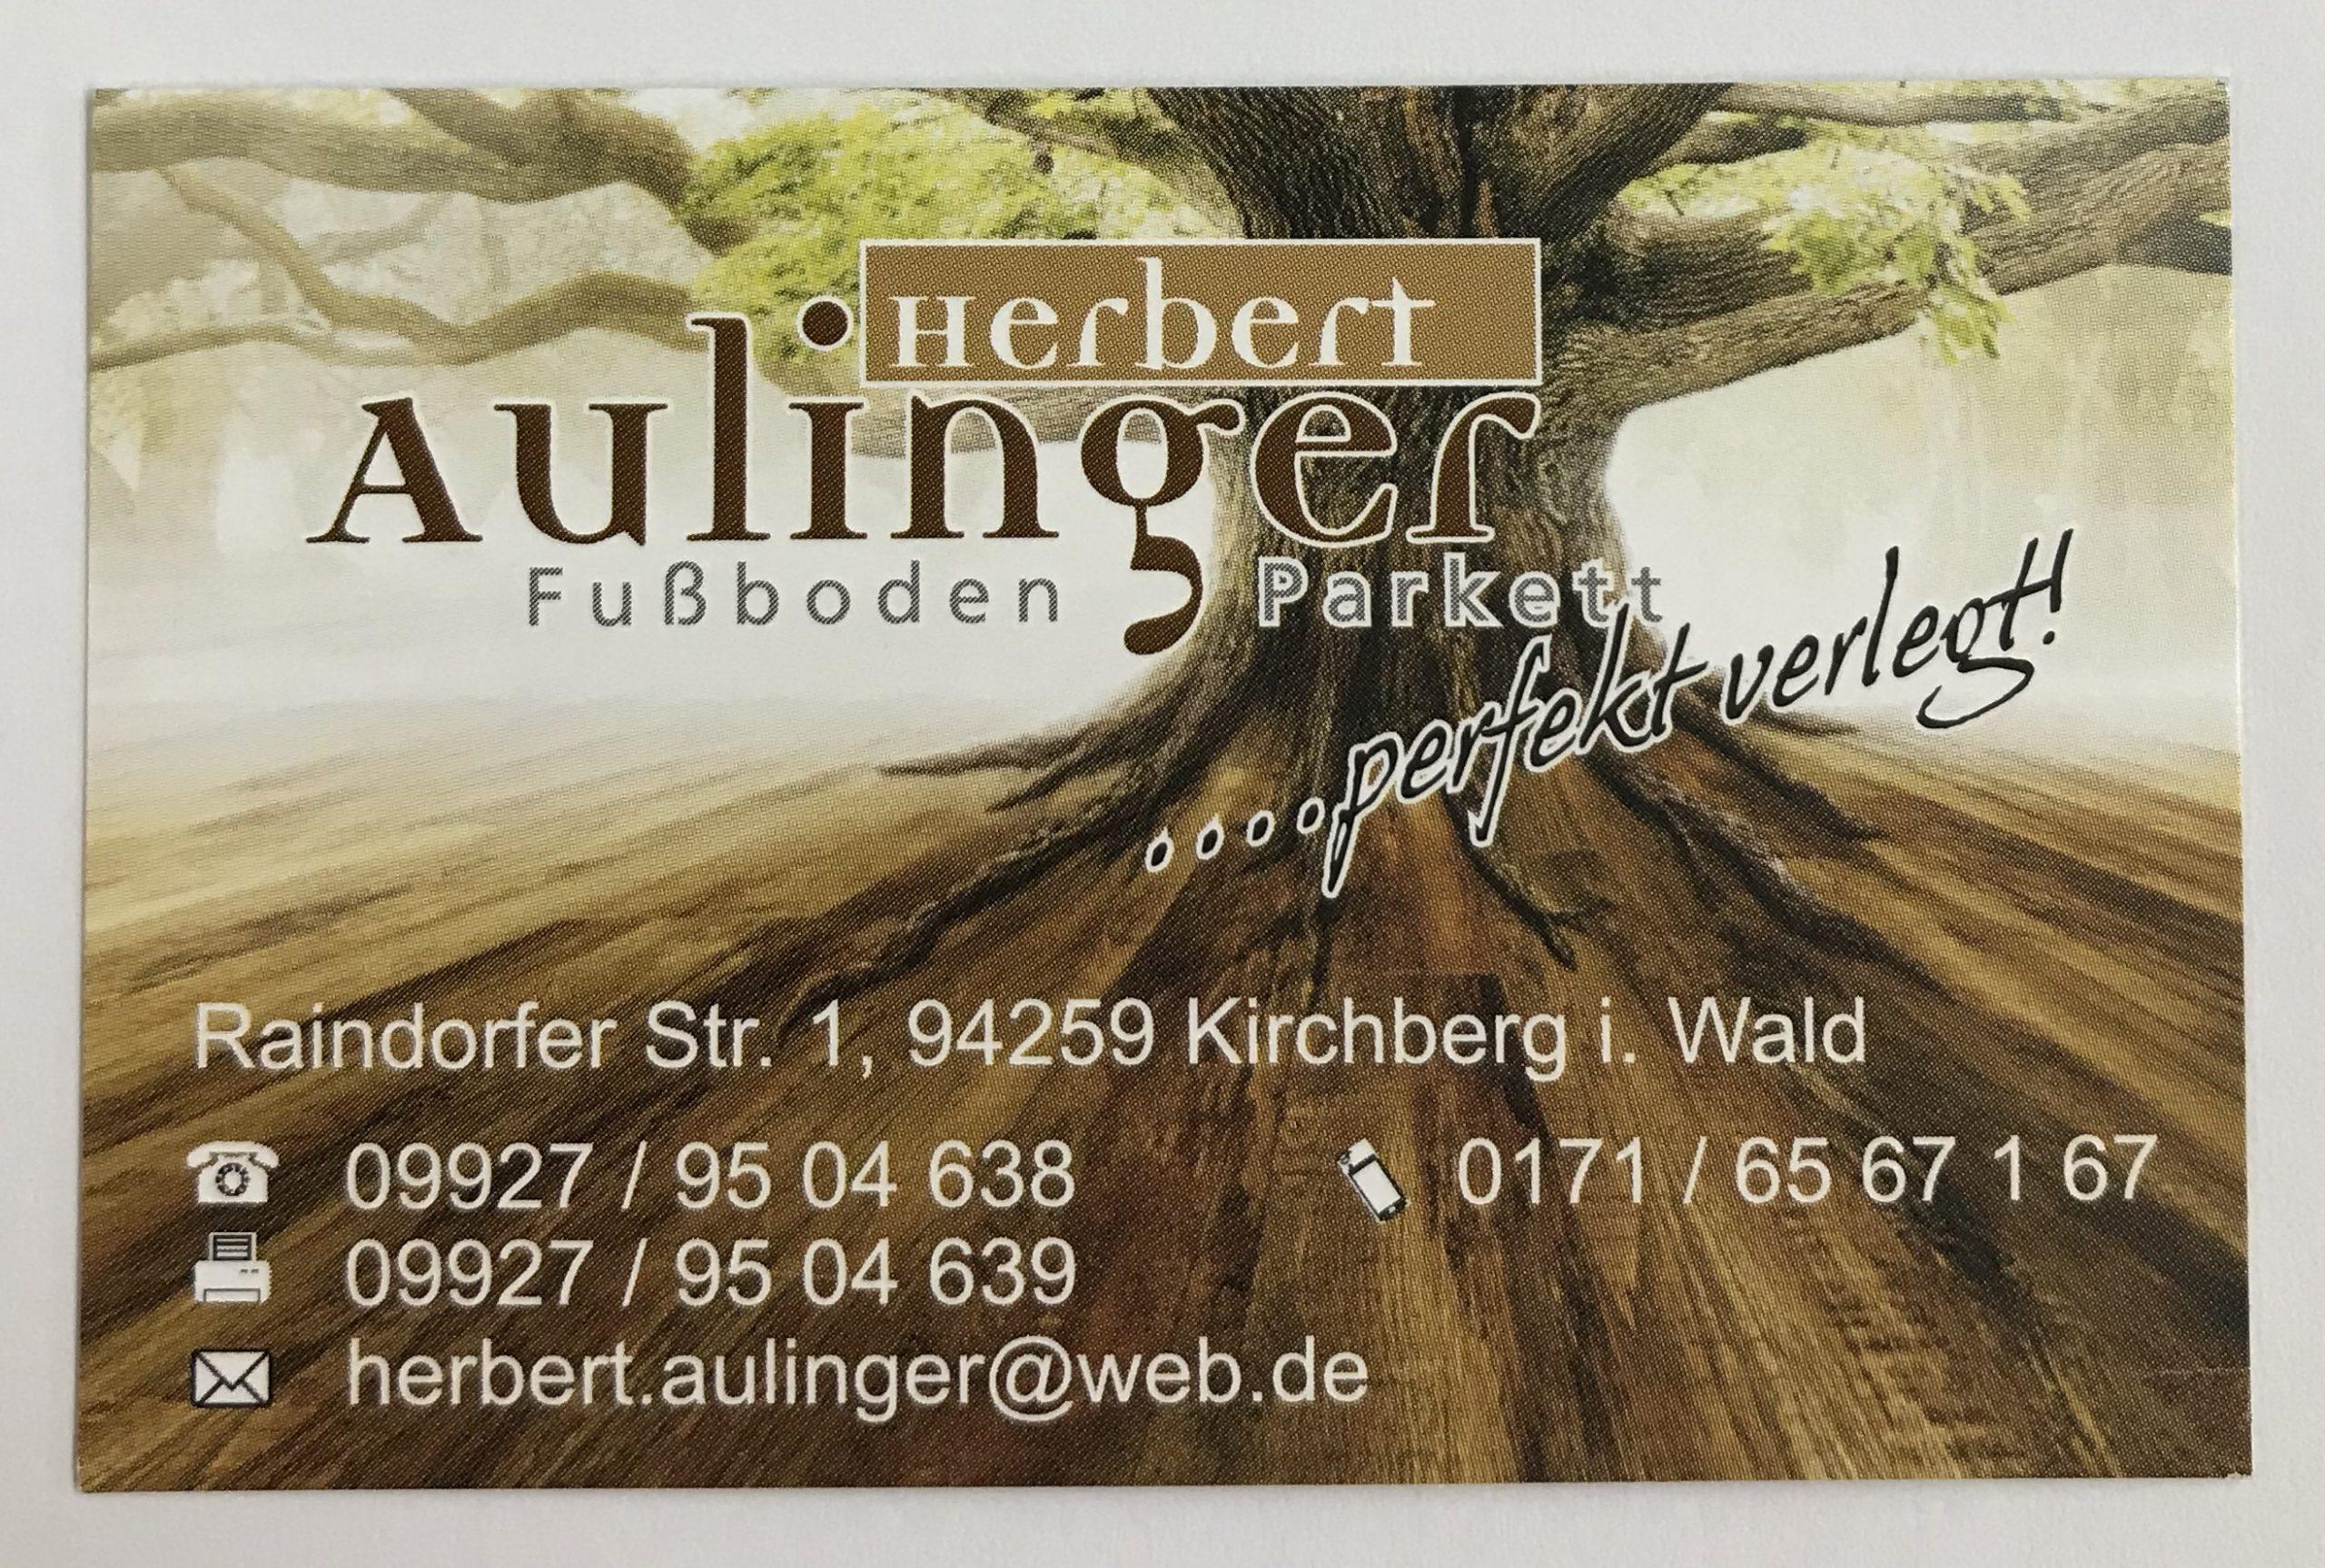 Boden & Farbe Aulinger